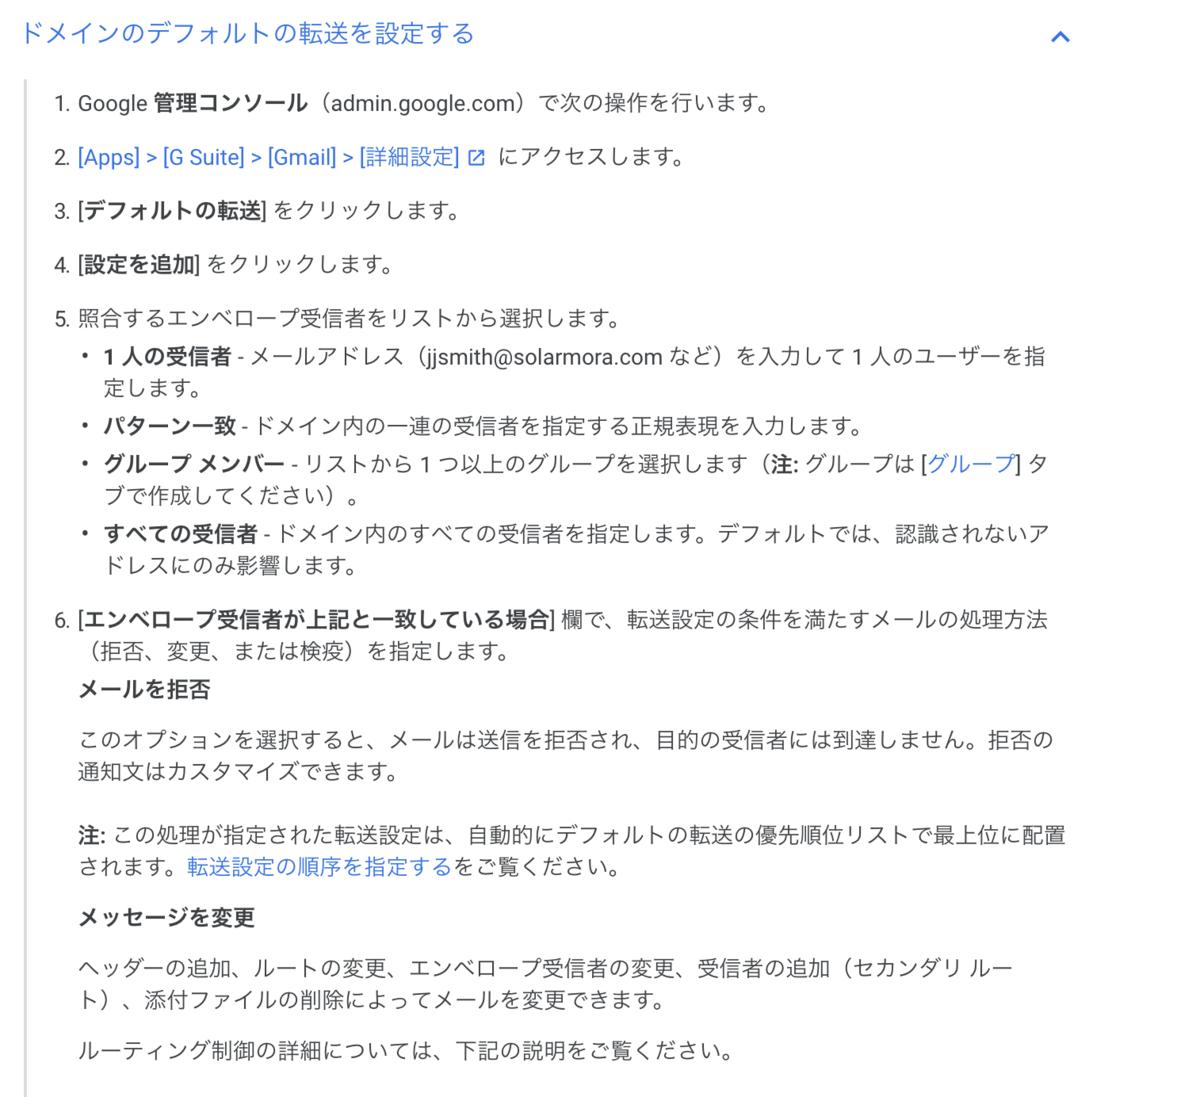 f:id:pikesaku:20190916172021p:plain